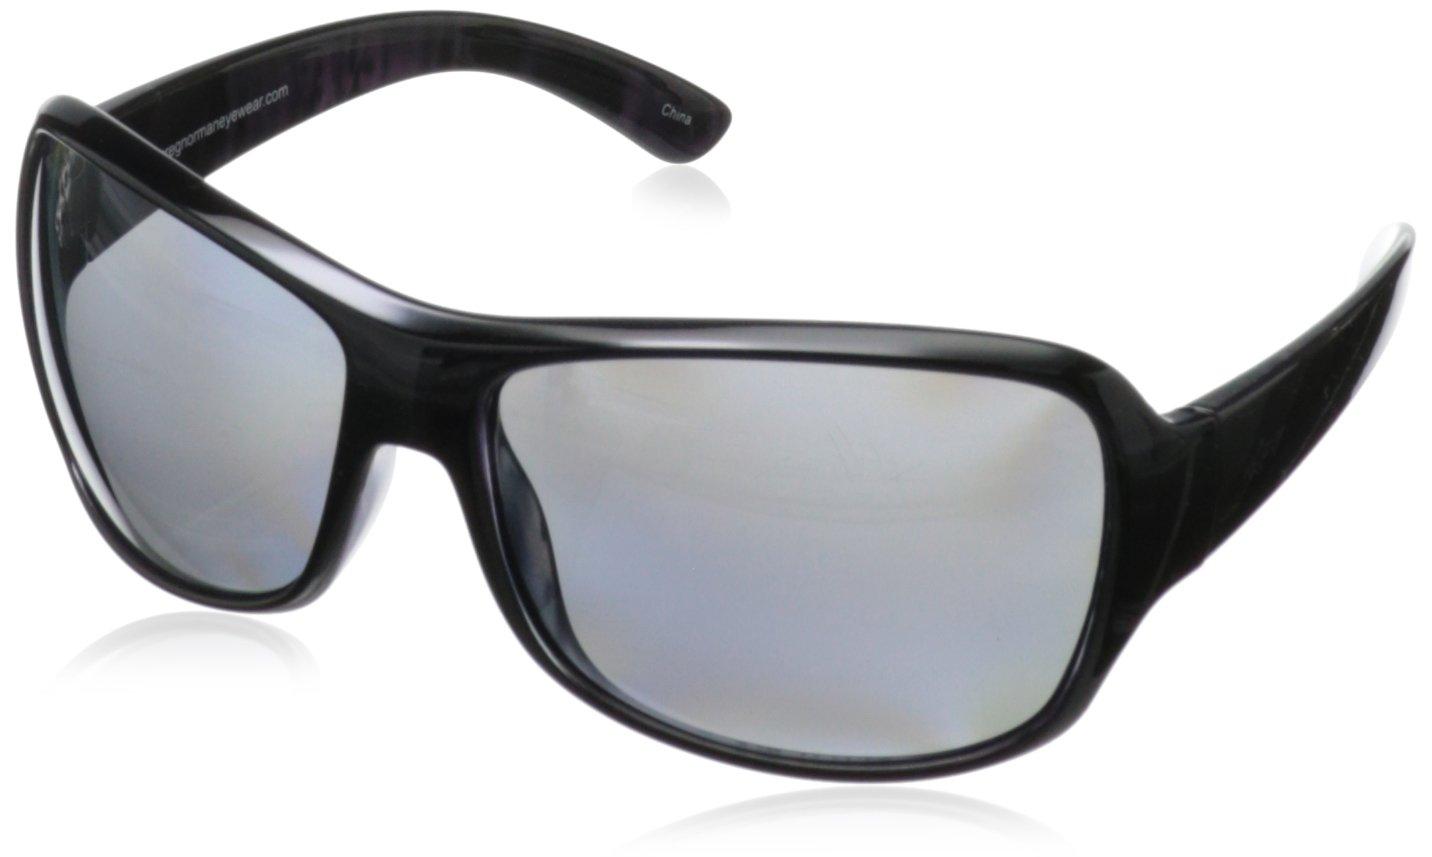 Greg Norman G4216 Polarized Sport Oversize Soft Square Glare Control Polarized Sunglasses,Shiny Black & Purple, 63 mm by Greg Norman